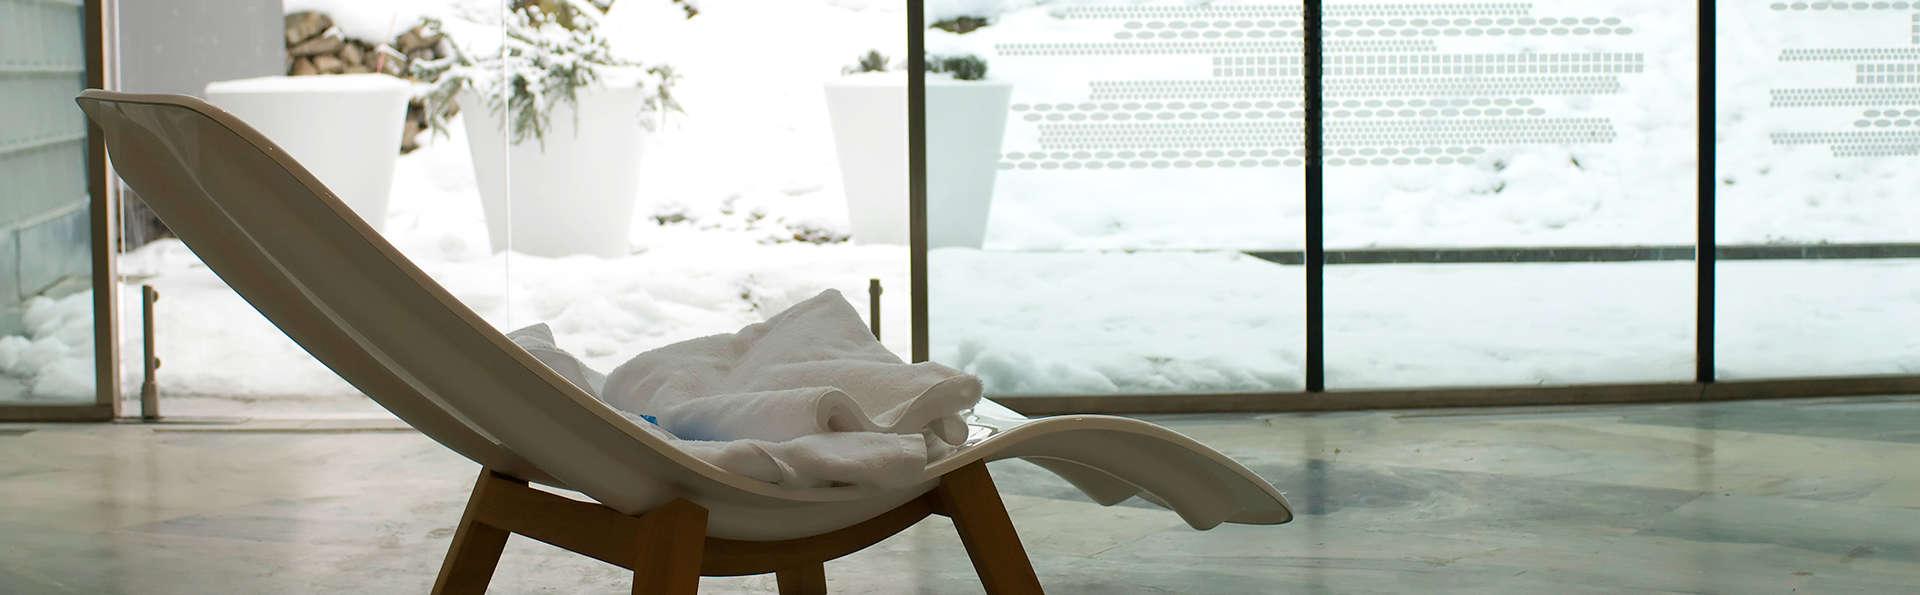 Es momento de descansar: Con pensión completa incluida en un balneario rodeado de montañas